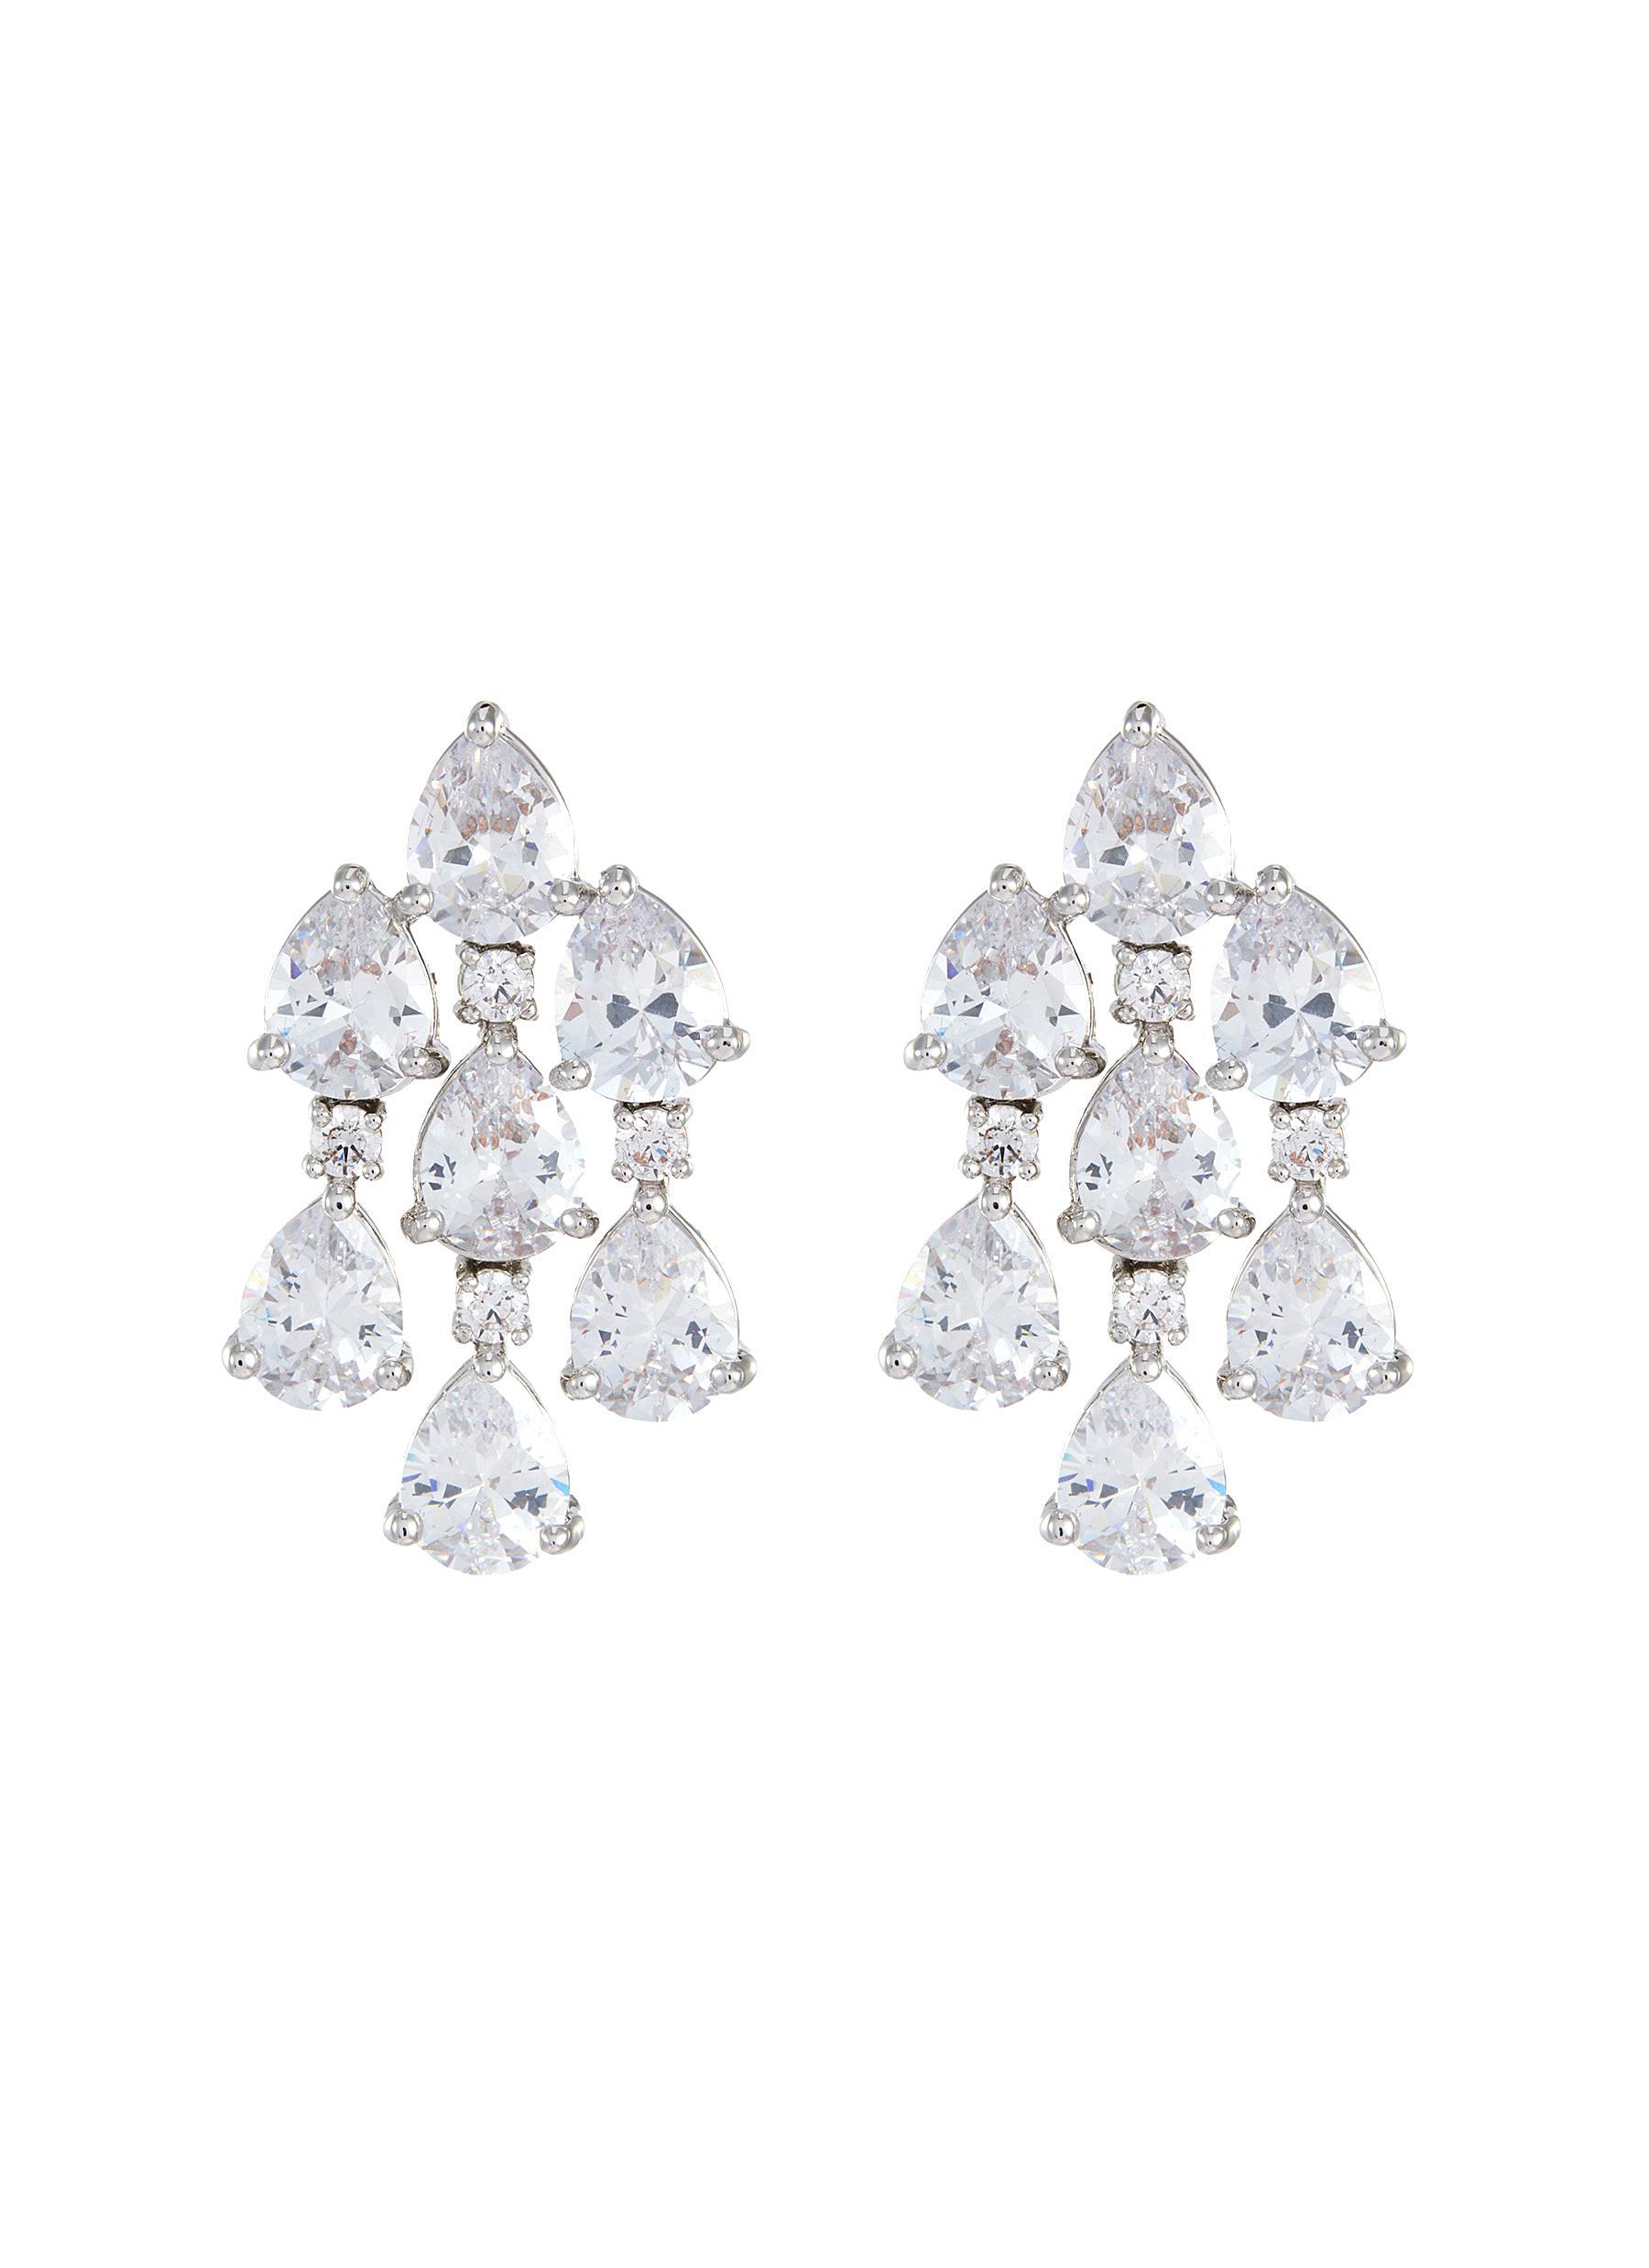 Pear Cut Cubic Zirconia Drape Earrings